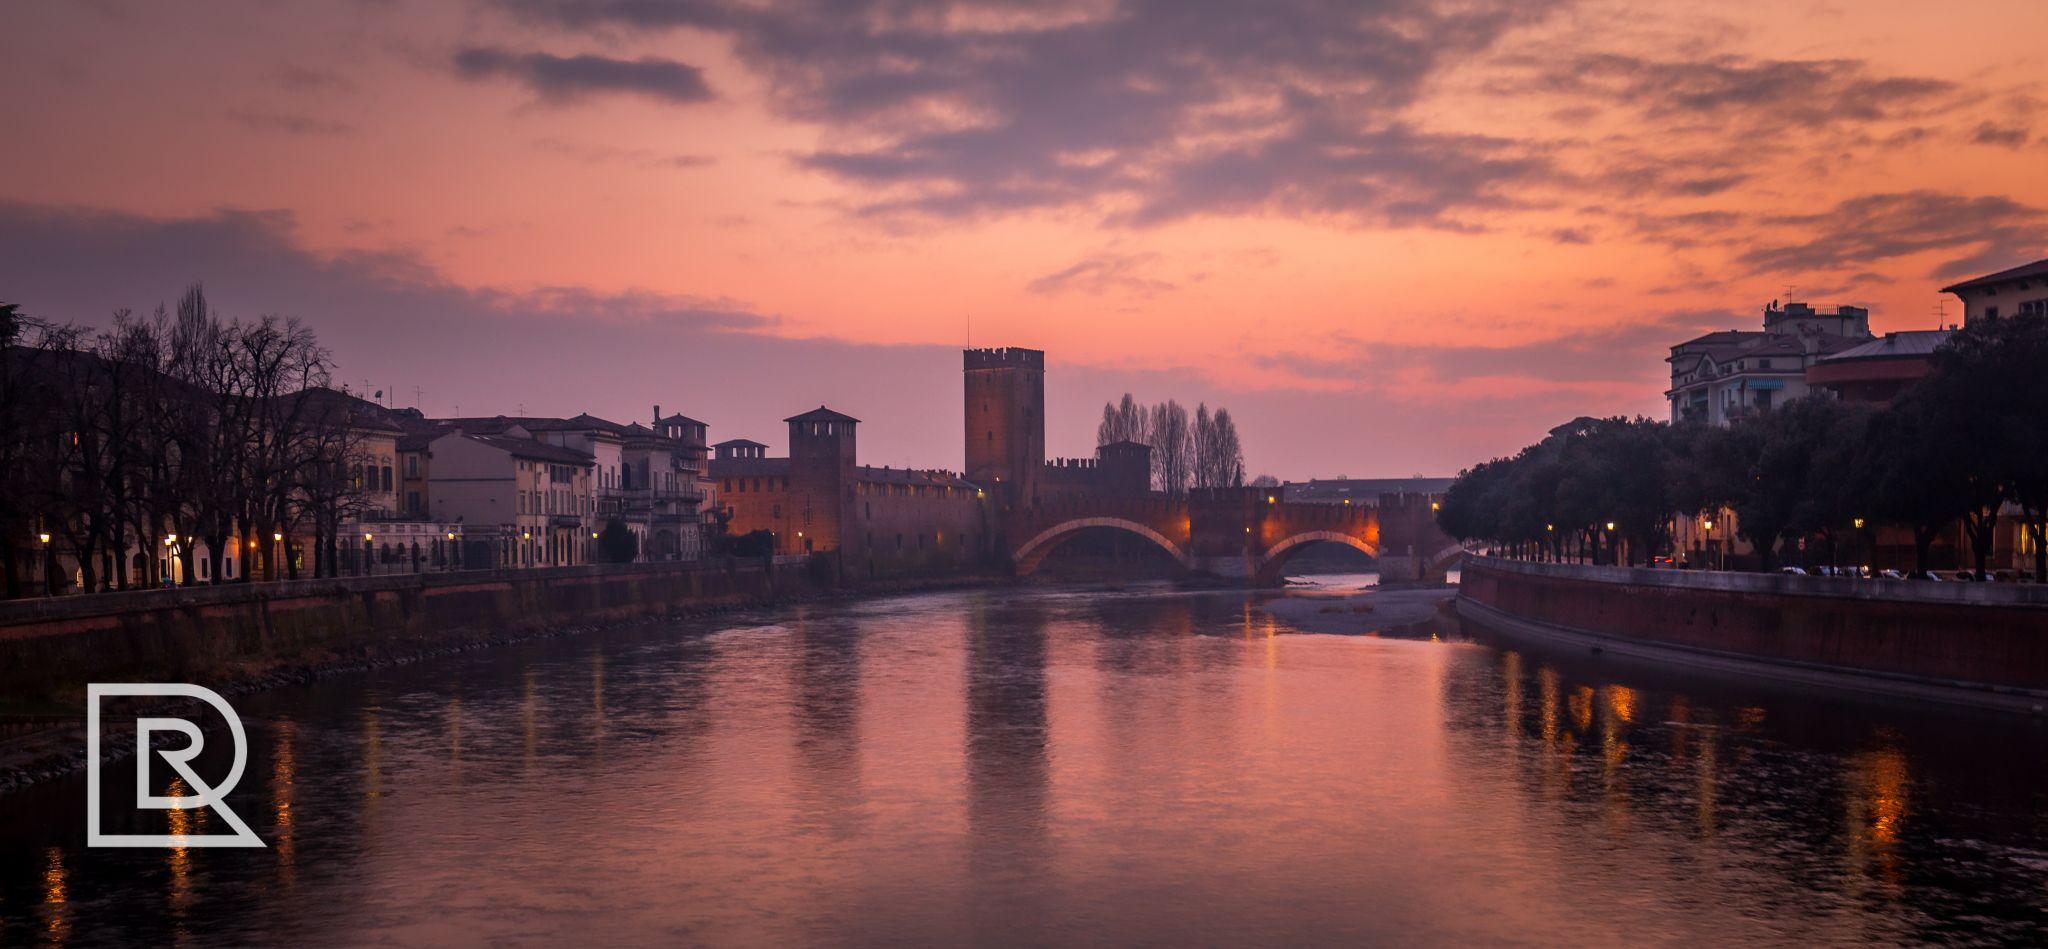 Sunset bridge, Italy